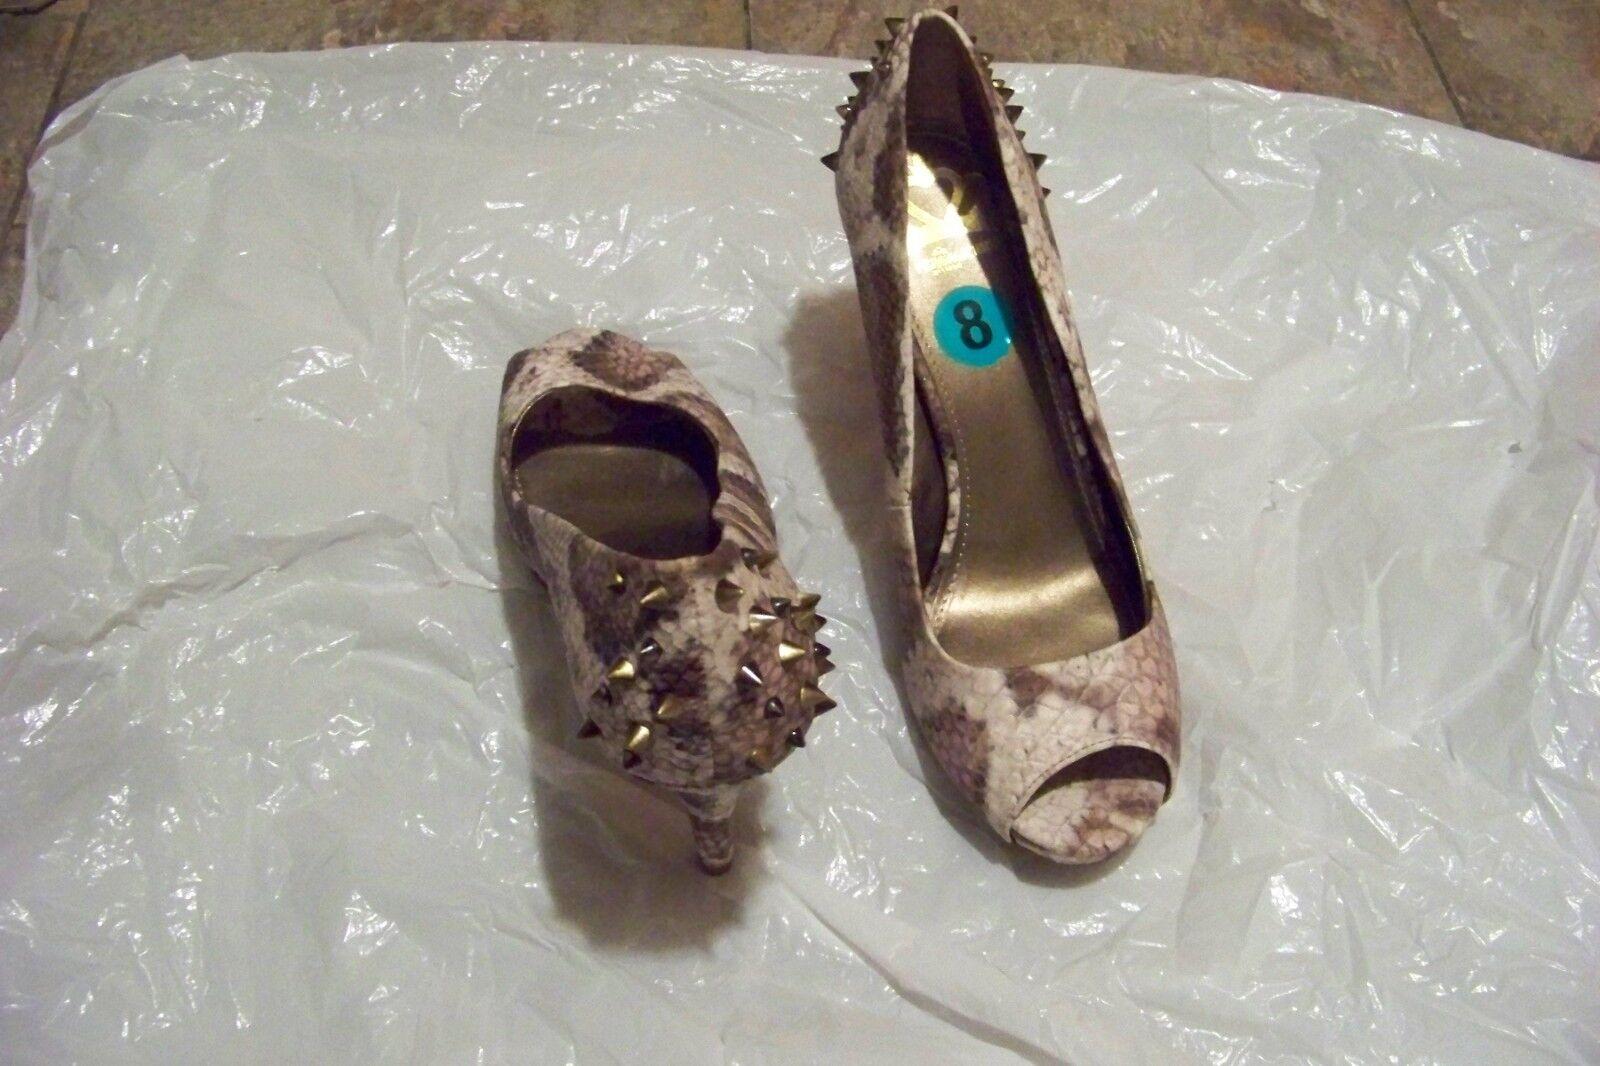 womens fergalicious studded grudge brown skin print open toe studded fergalicious heels shoes 8 7c12bd